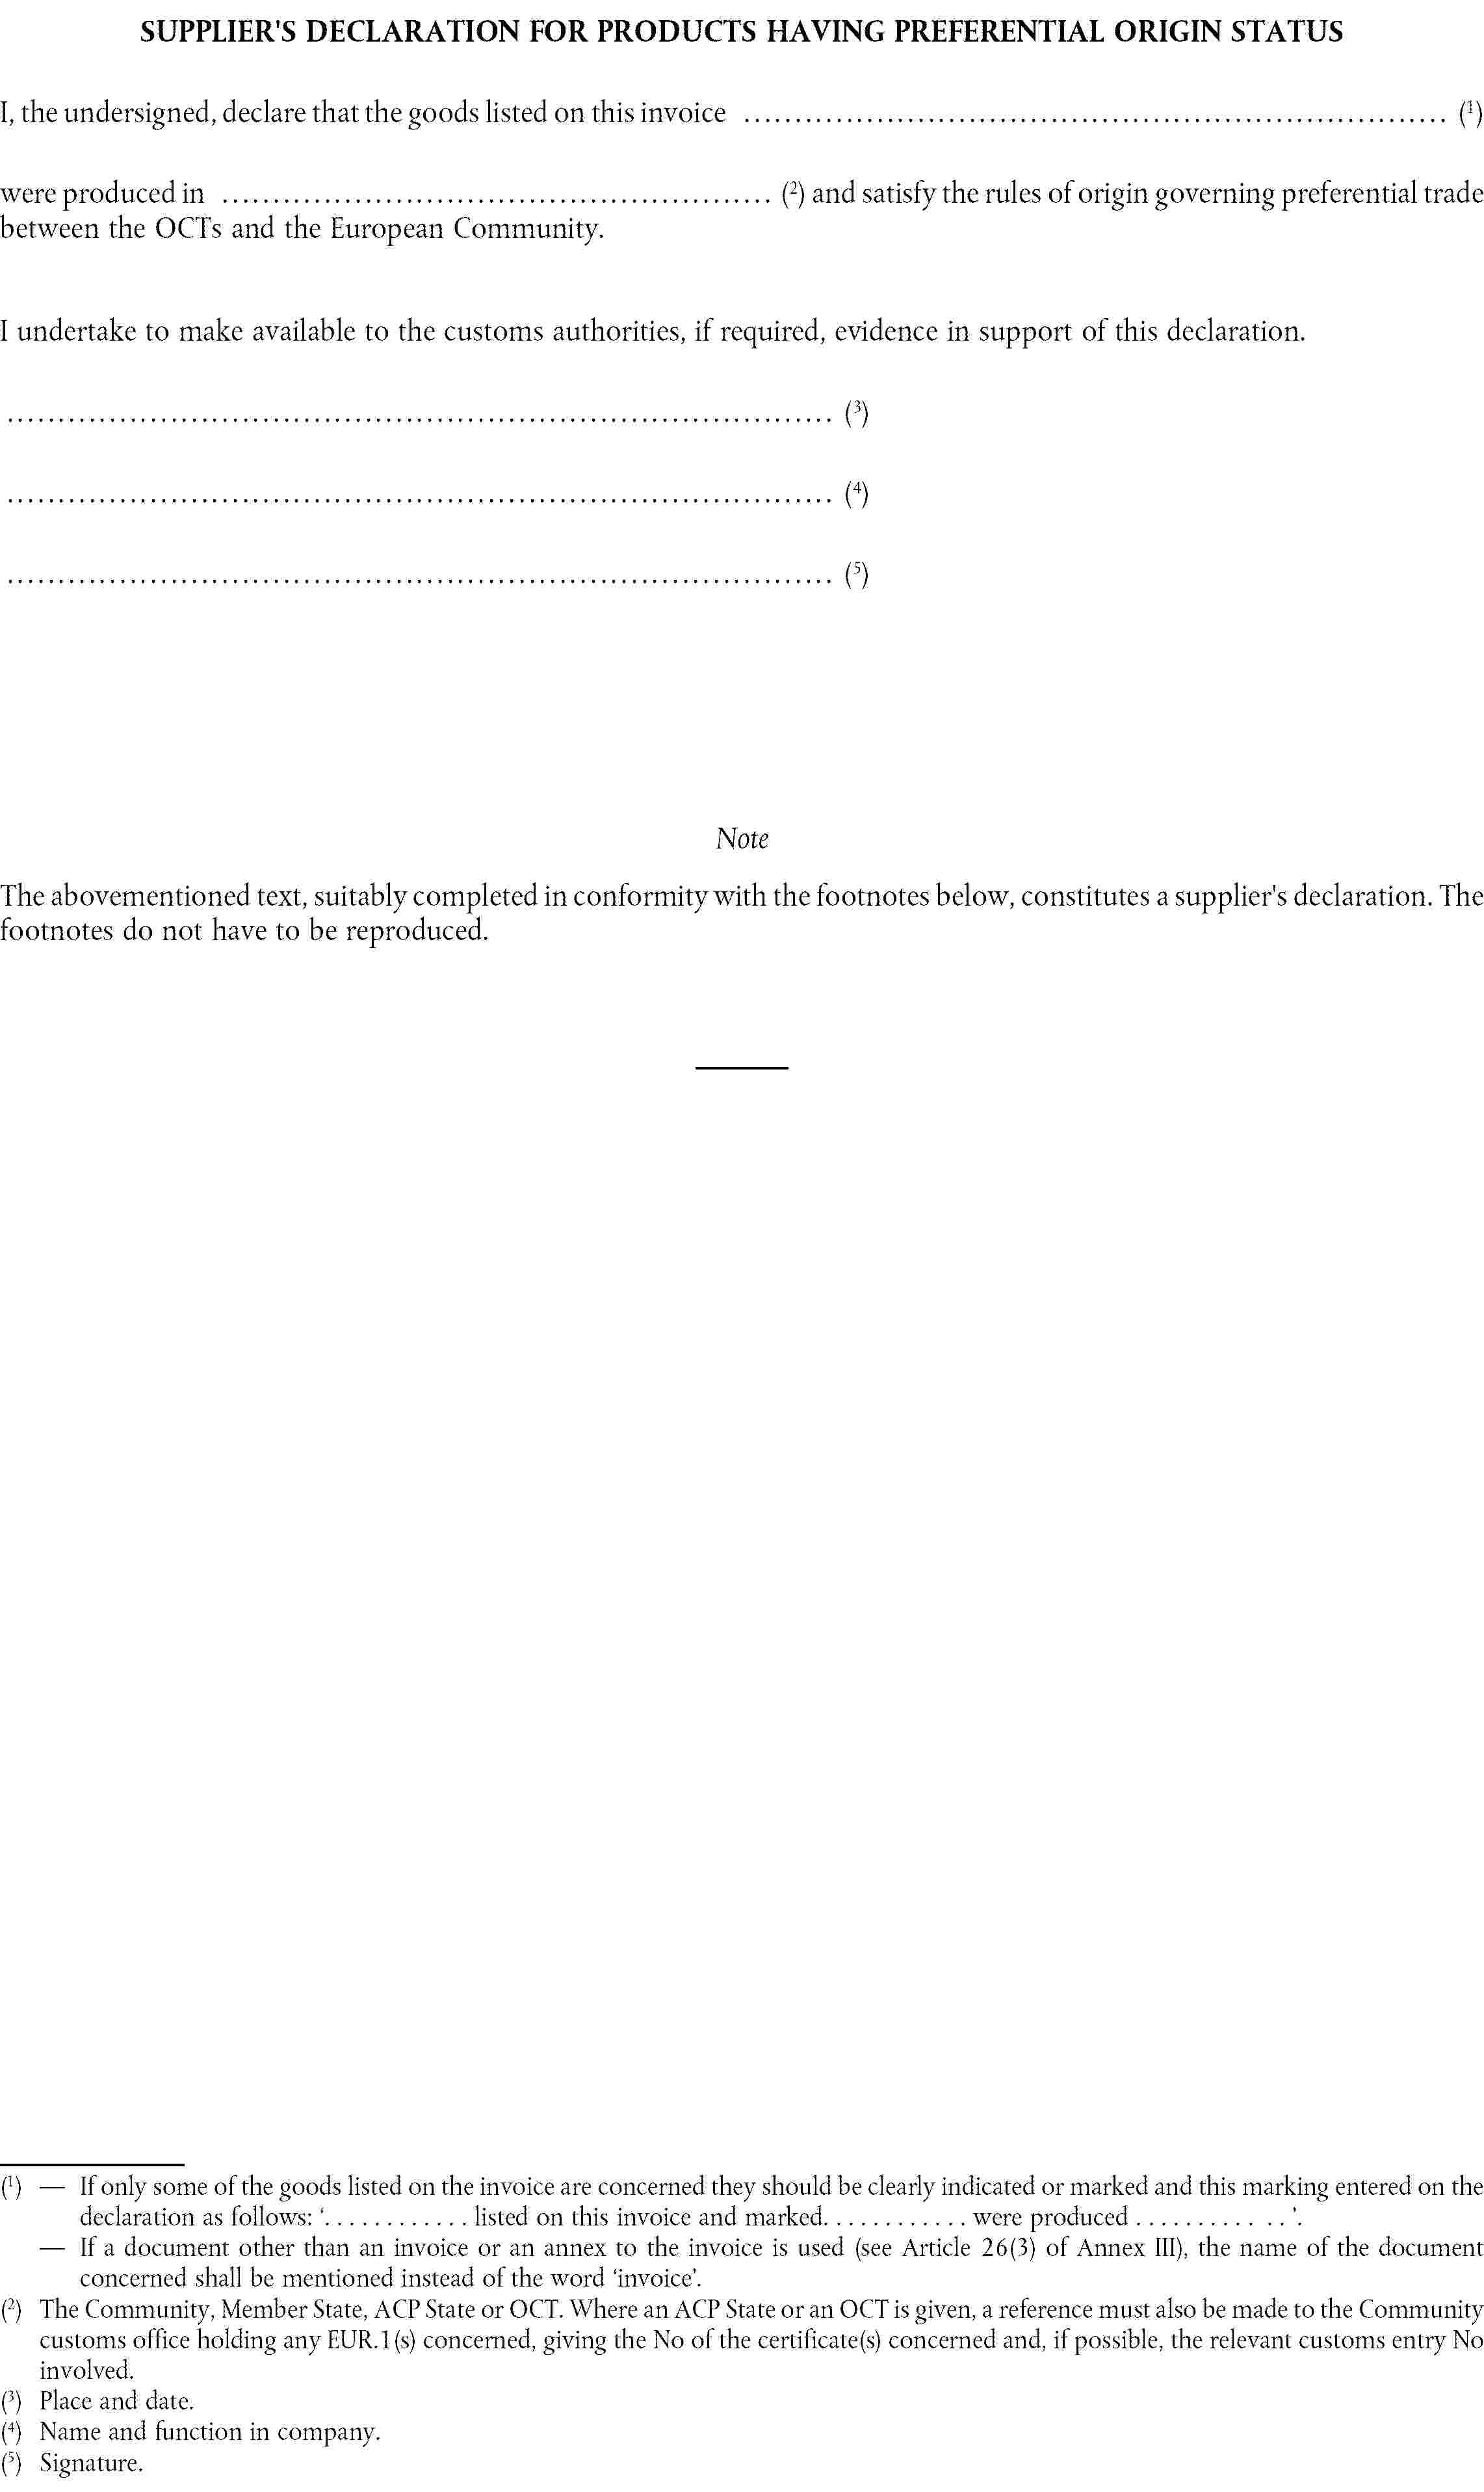 Dissertation on leadership xbox one